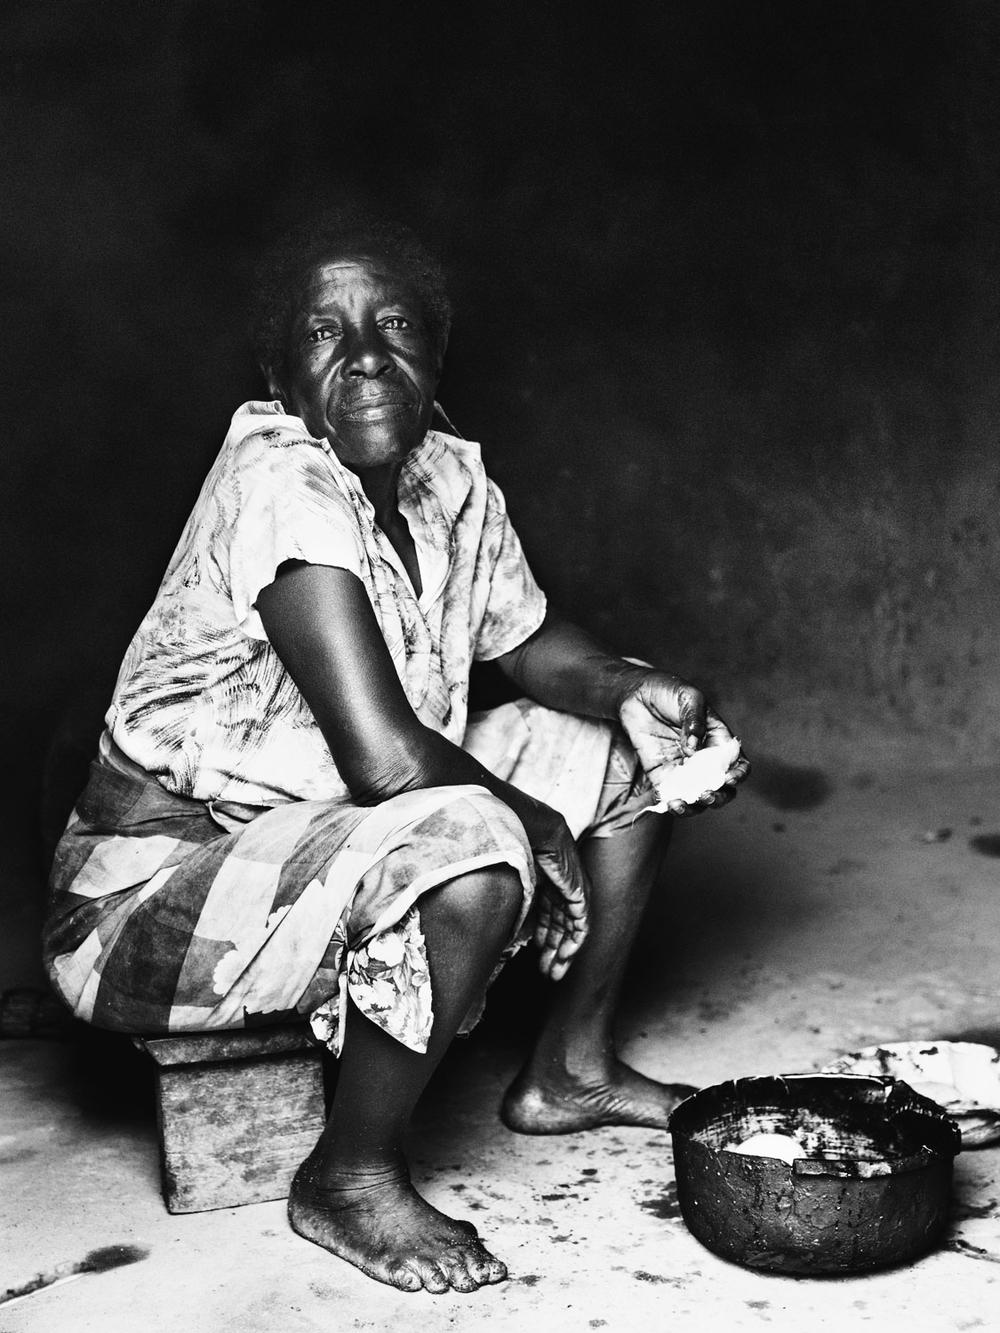 CallieGiovanna_Africa_Malawi_KandeBeach_20150101_05813.jpg